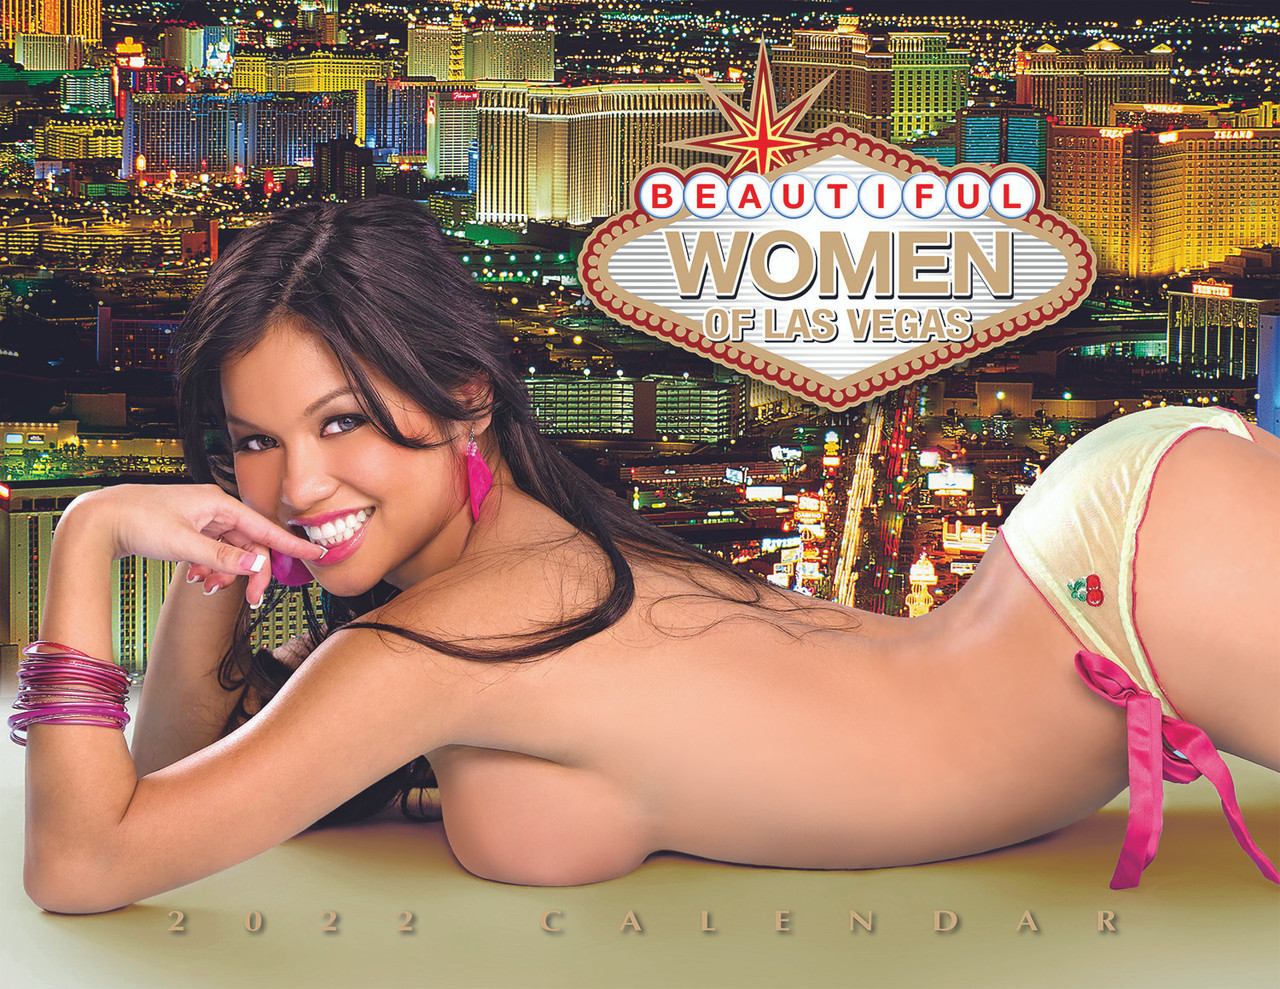 Las Vegas Calendar 2022.2022 Las Vegas Women Calendar